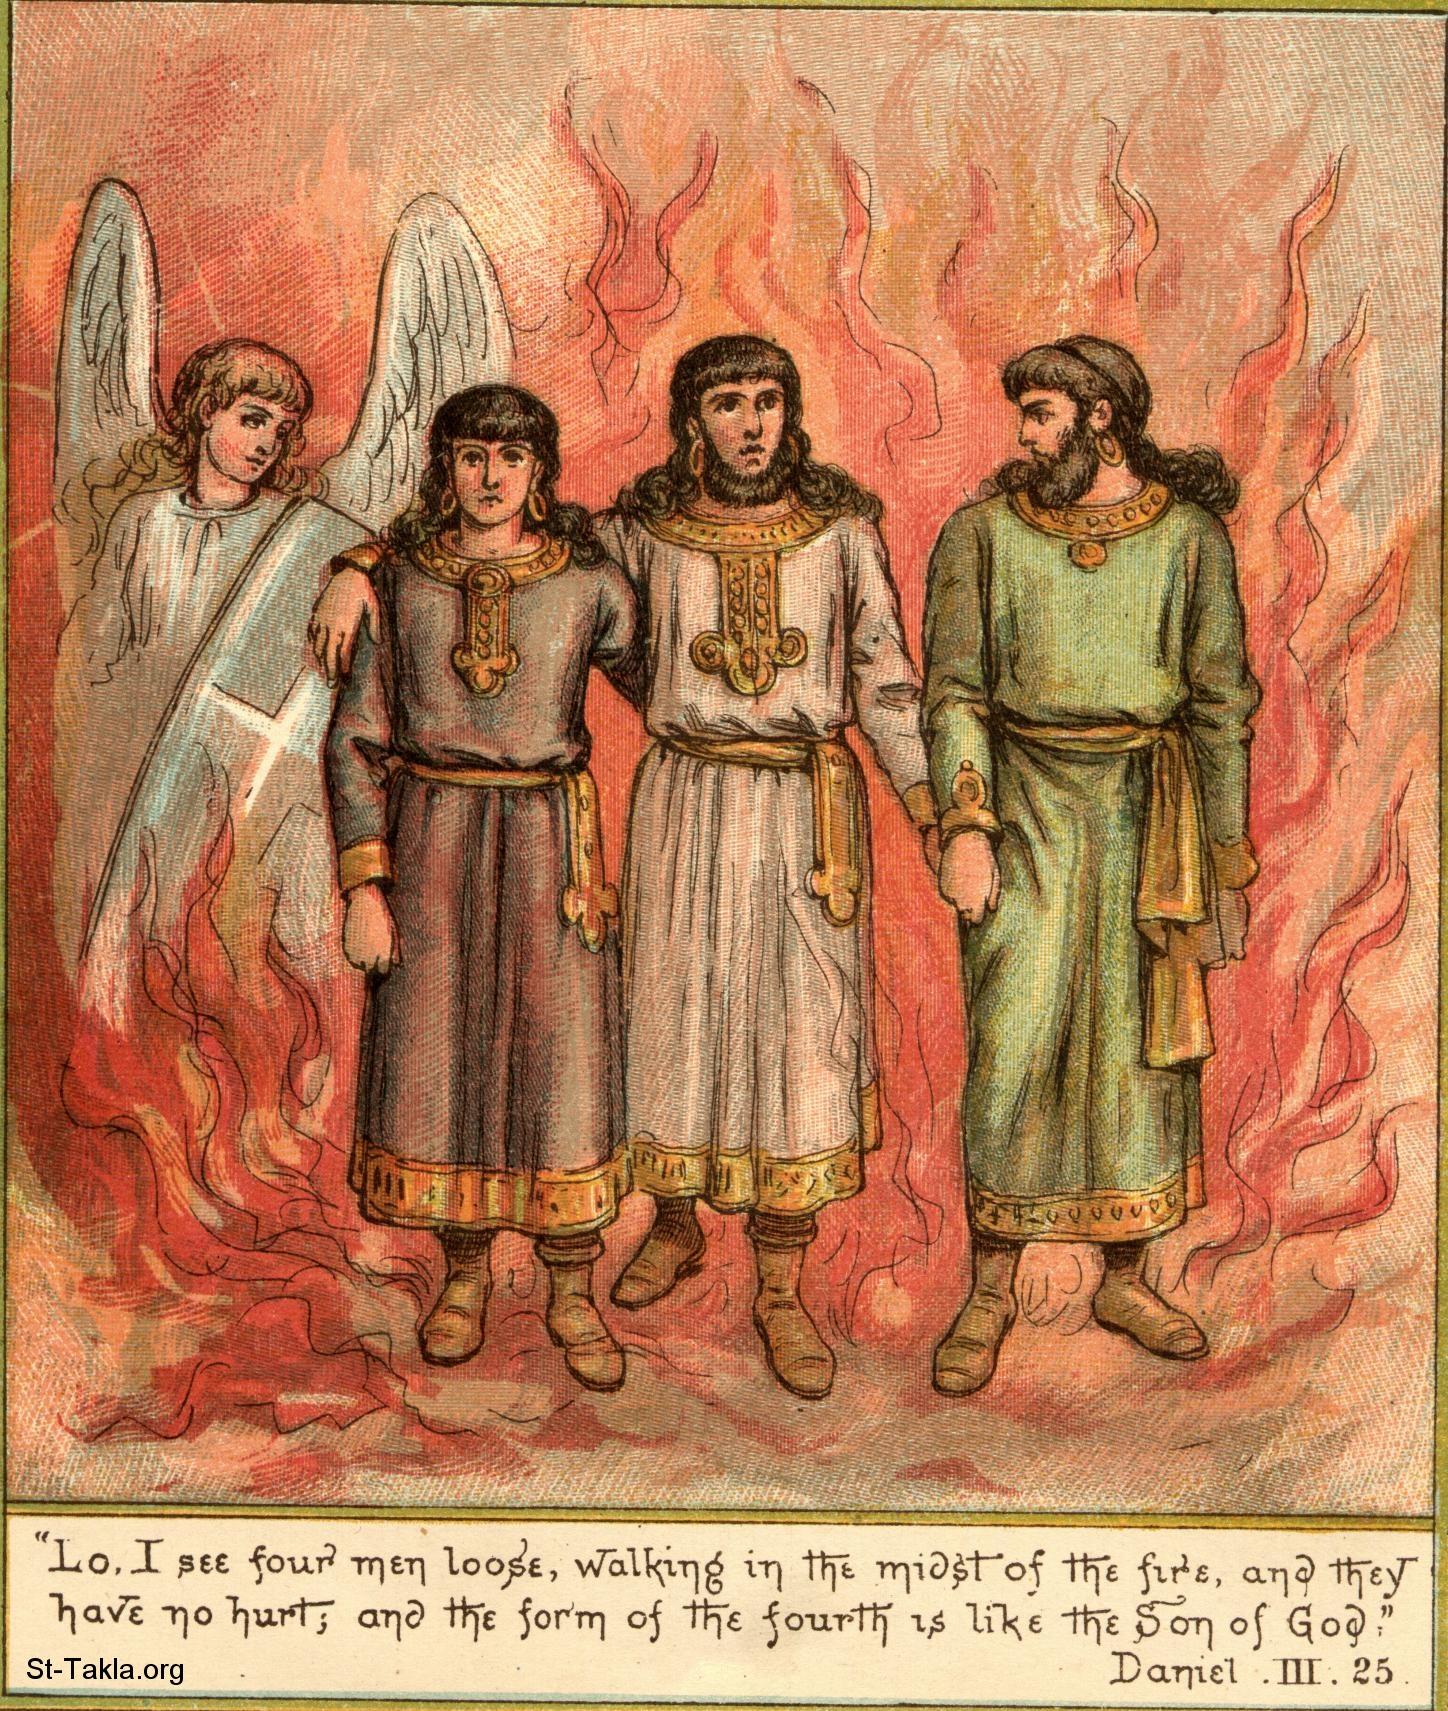 COV ZAJ NYEEM NRUAB LIS PIAM 2012 Www-St-Takla-org--angel-appears-in-furnace